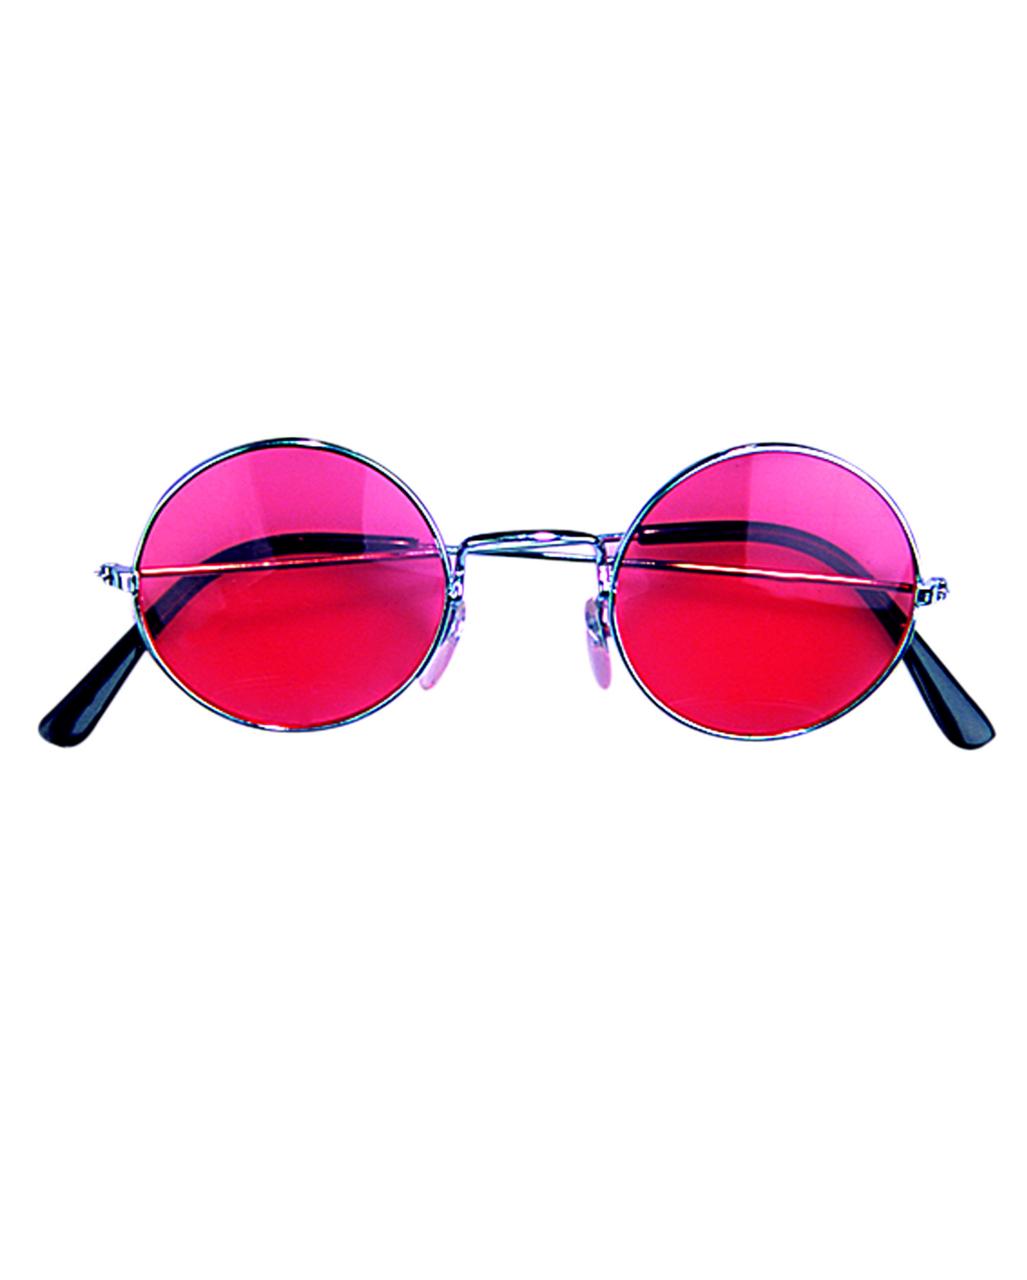 05ef70f816a1 Nickelbrille pink